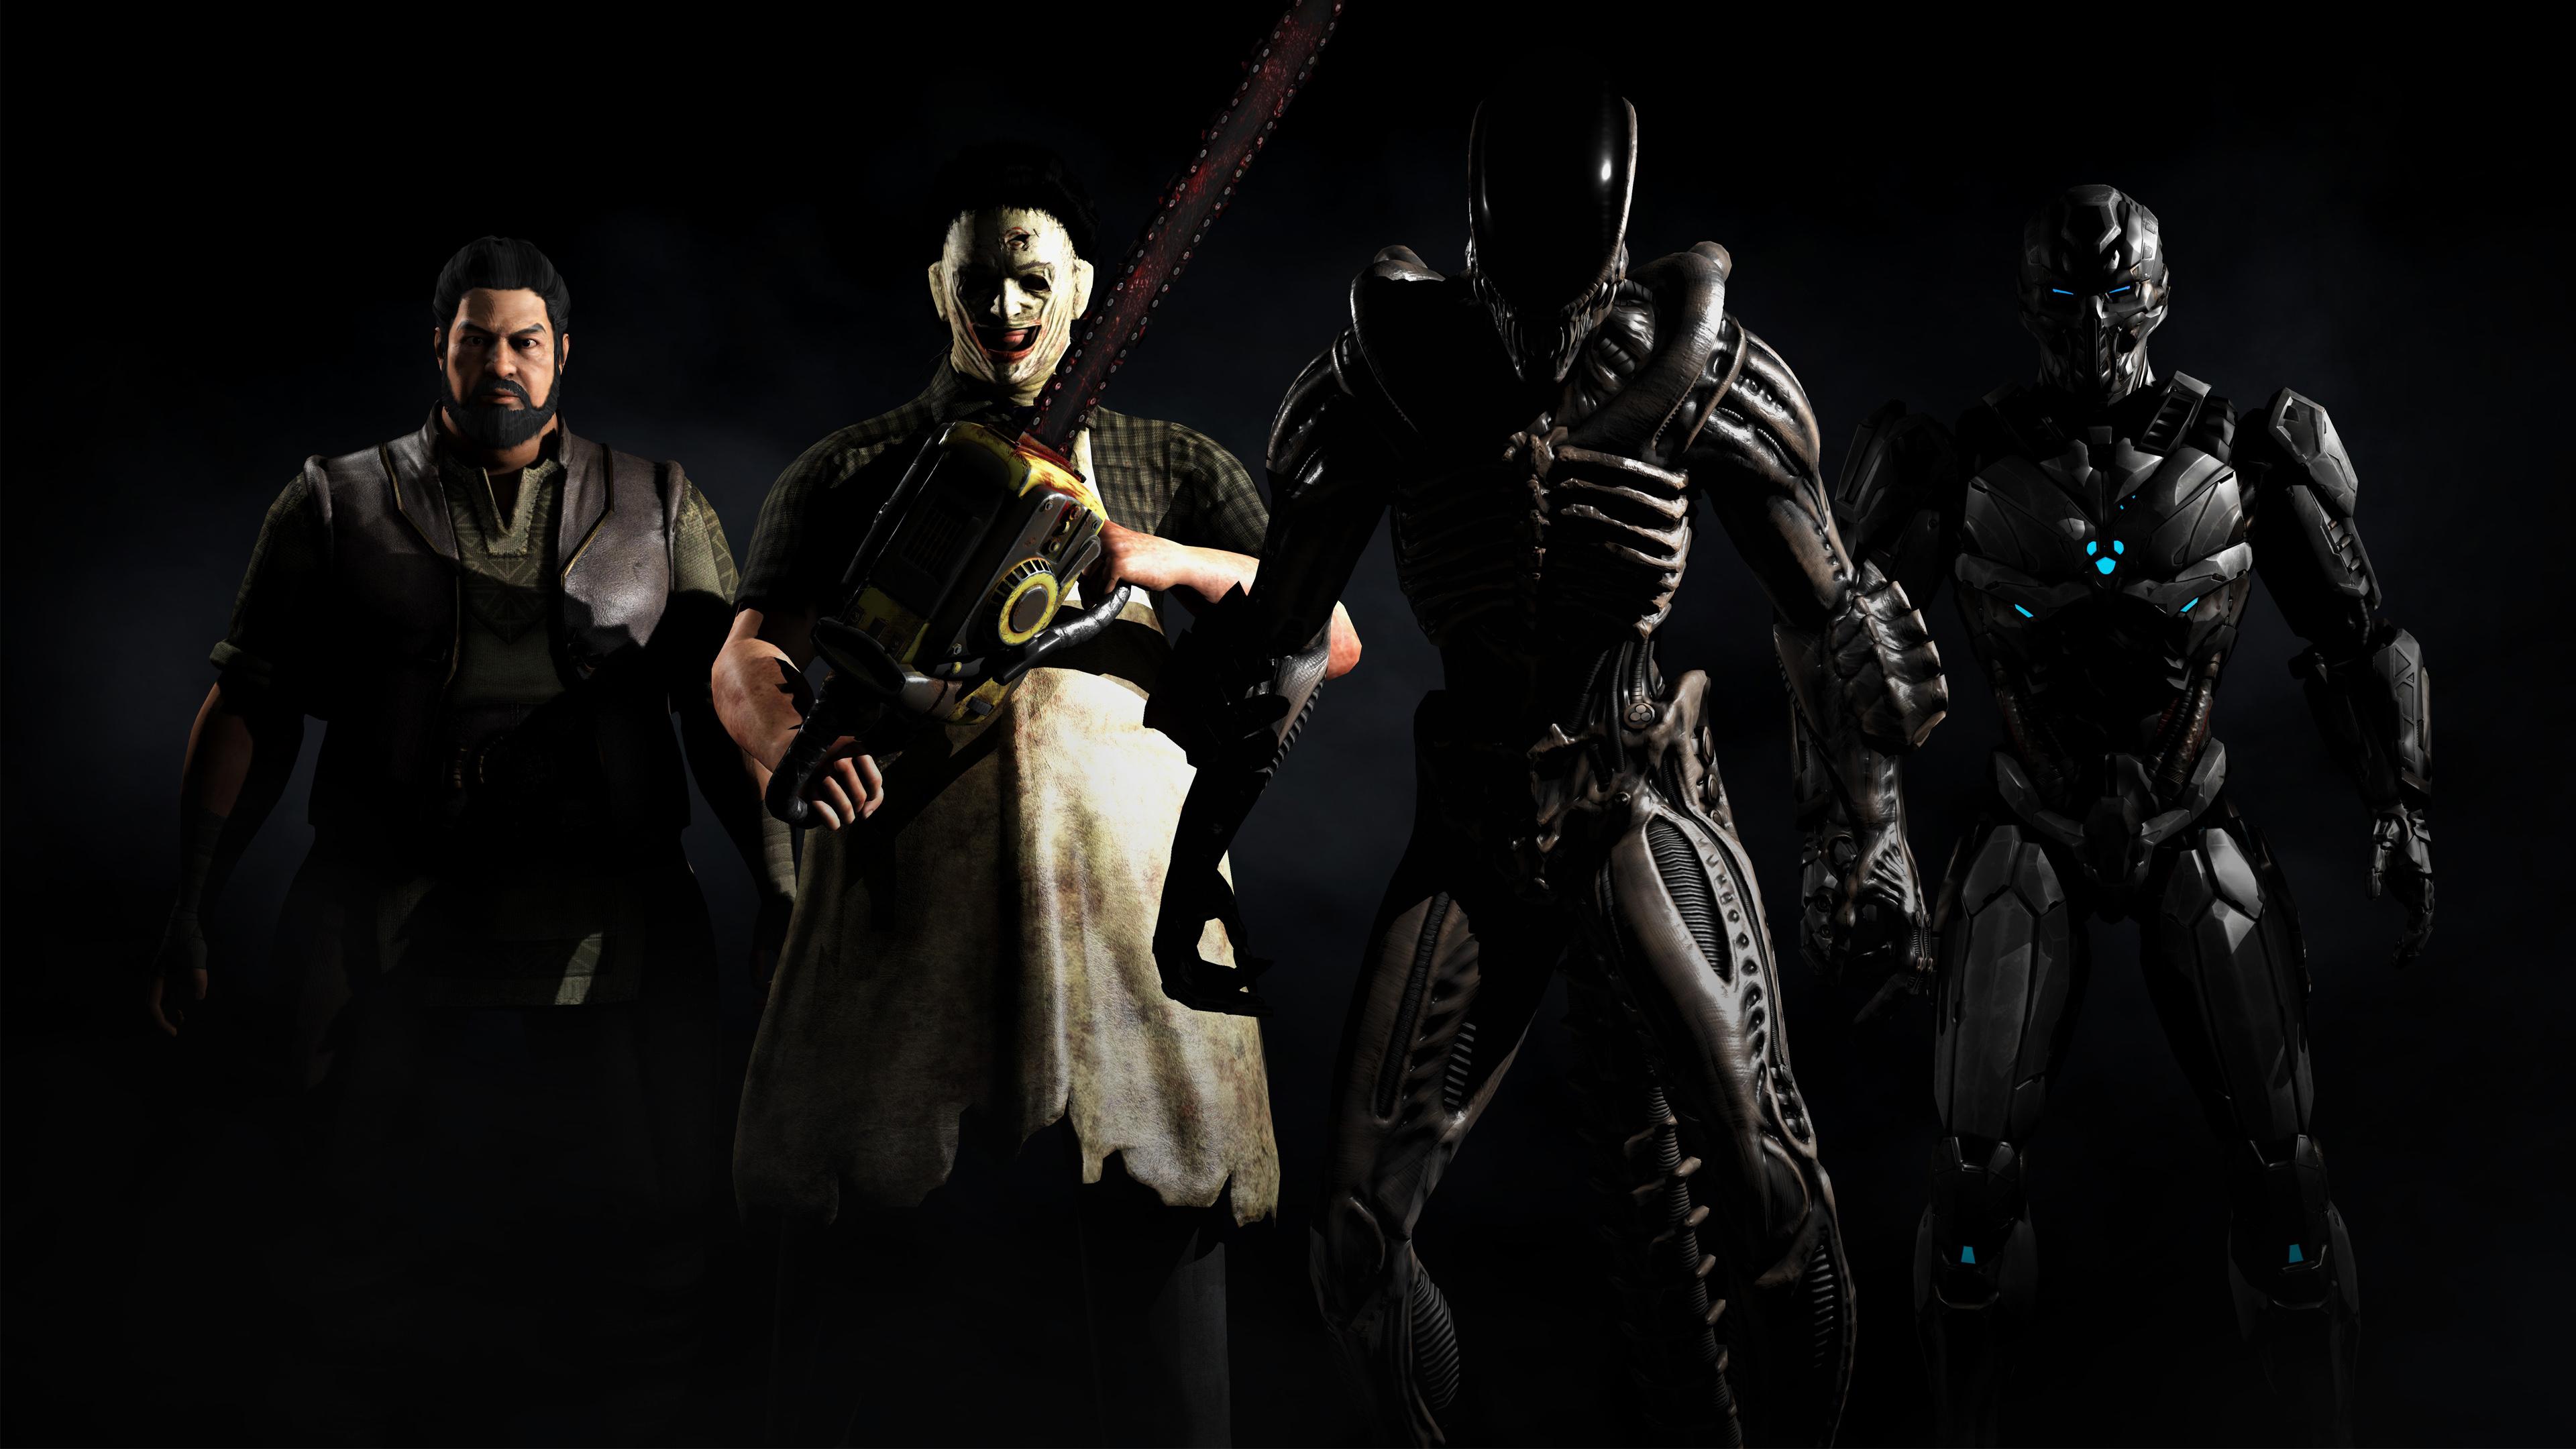 Mortal Kombat X Kombat Pack 2 Wallpaper DESKTOP BACKGROUNDS Best 3840x2160